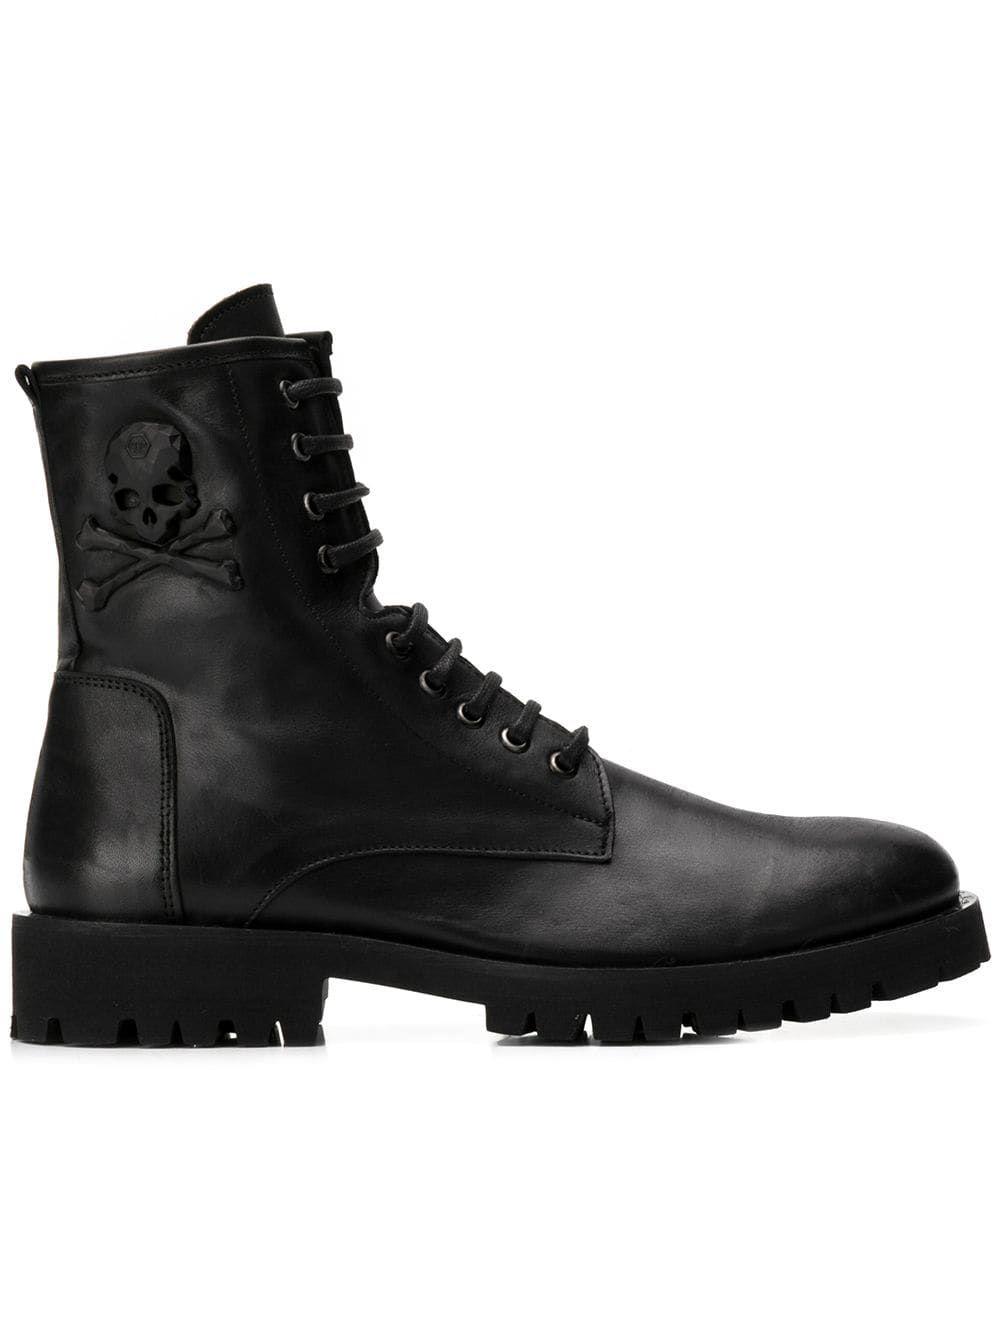 b5cd0f90a34 PHILIPP PLEIN PHILIPP PLEIN ROCK MAN BOOTS - BLACK.  philippplein  shoes